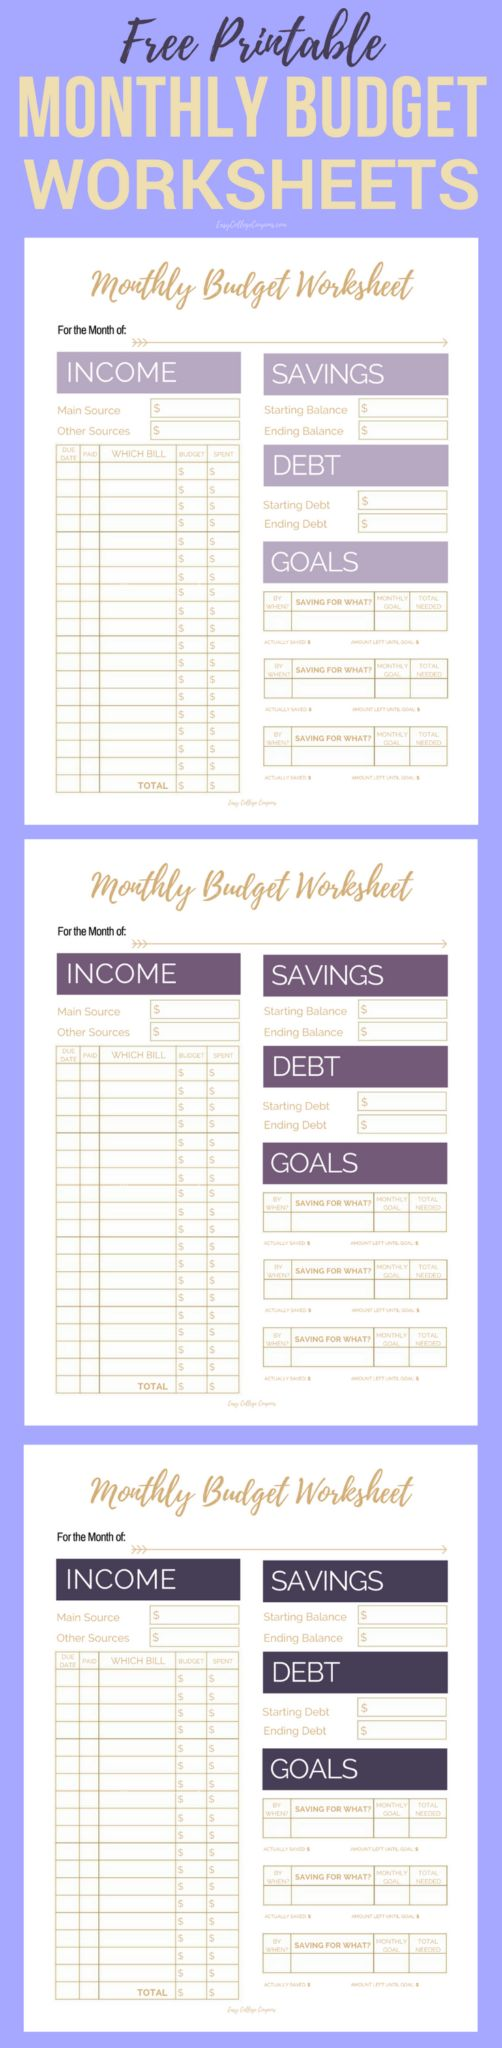 Budgeting worksheets free